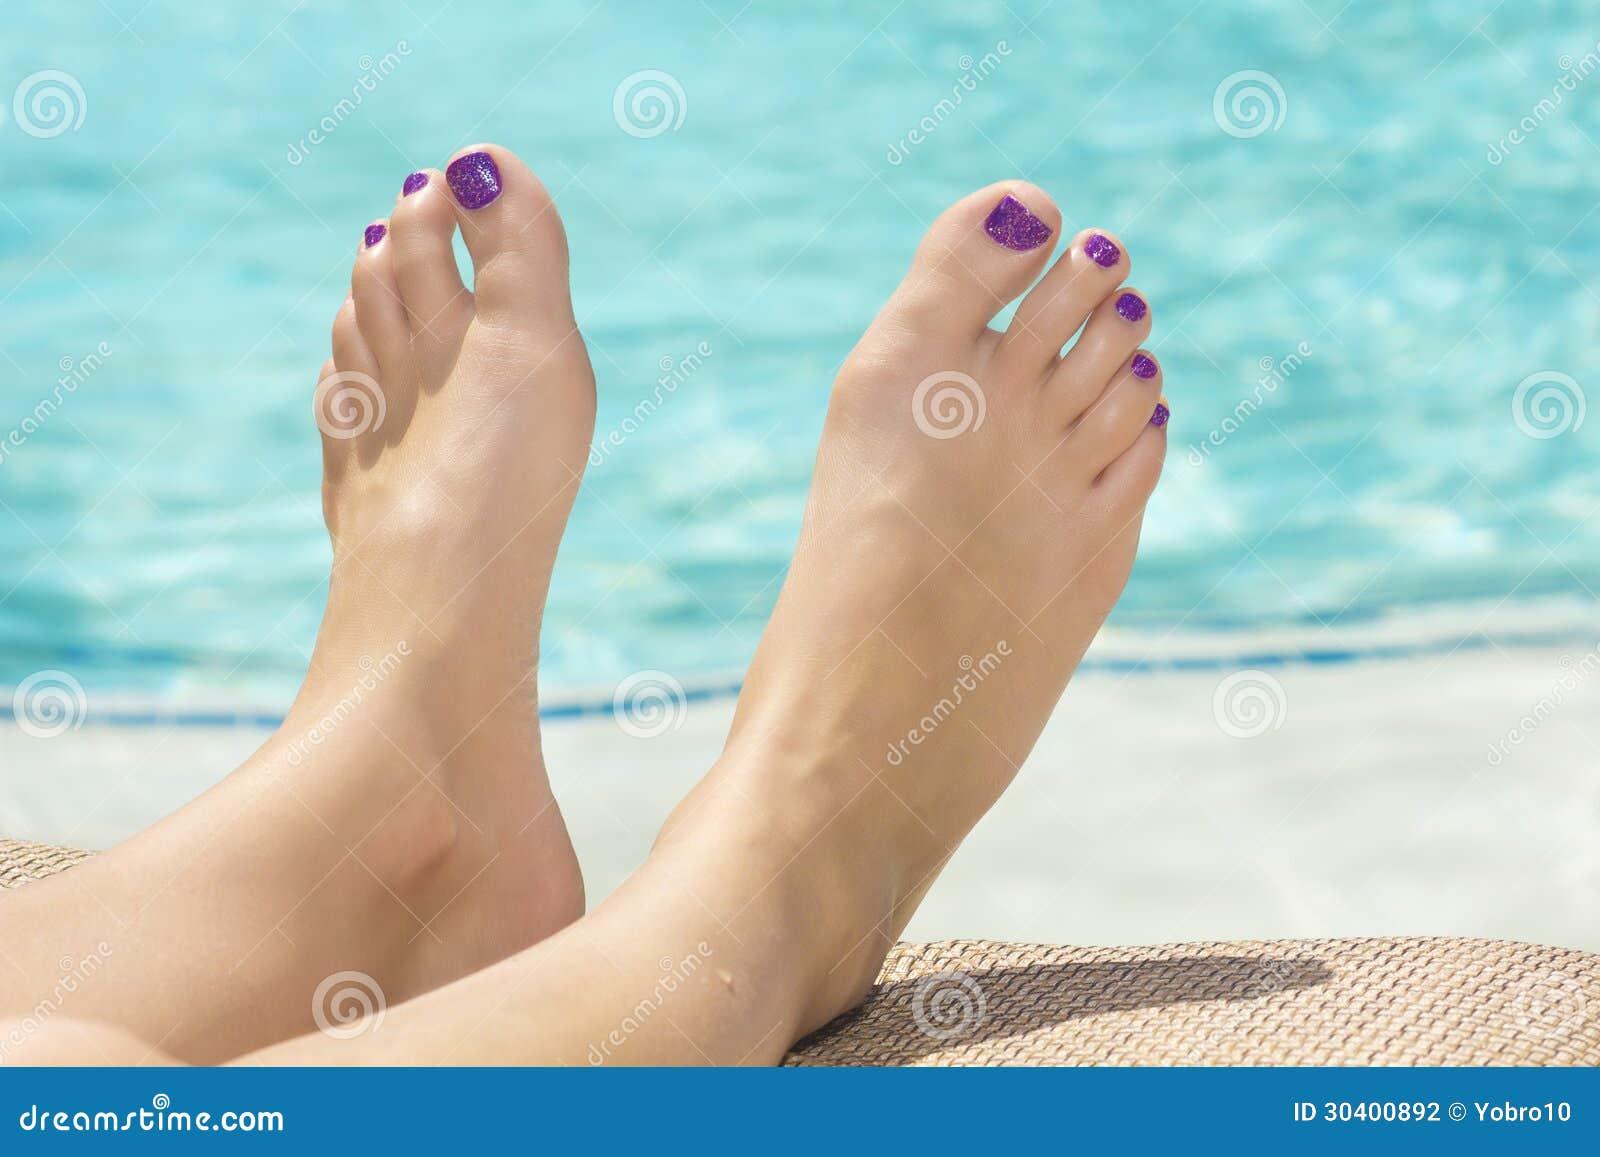 Сексуальные пальцы ног фото 27-345